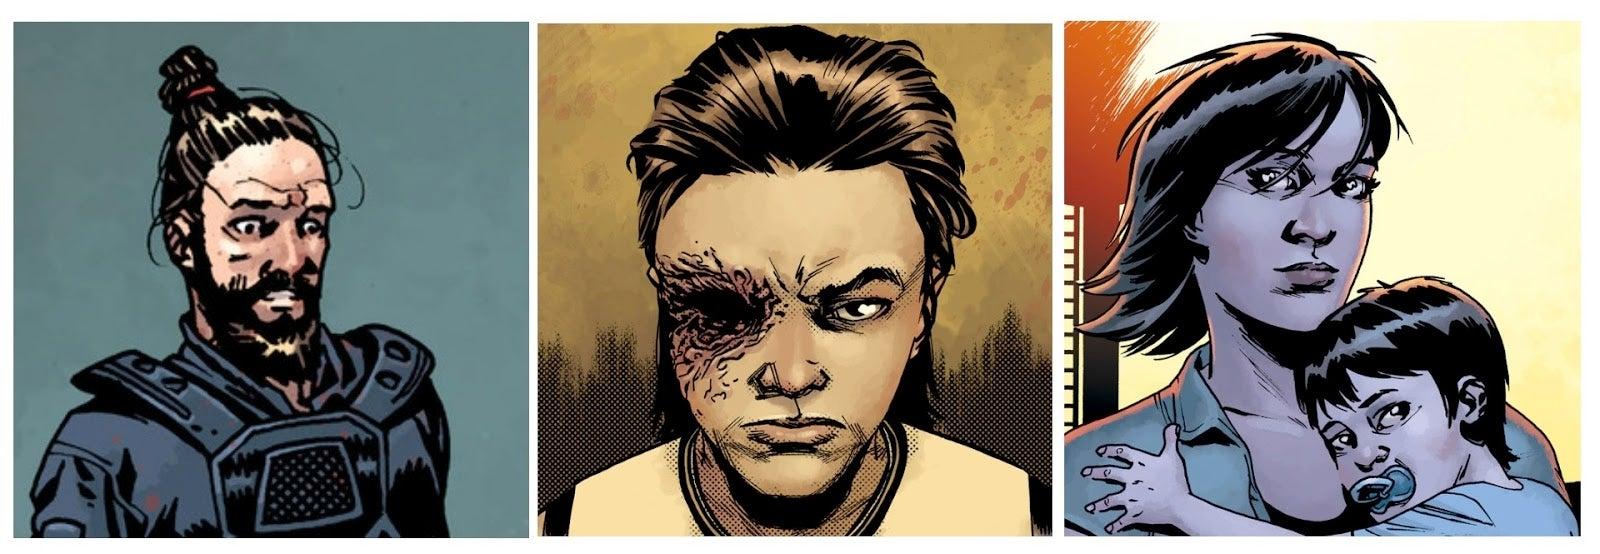 No, The Walking Dead Comic Hasn't Gotten Boring